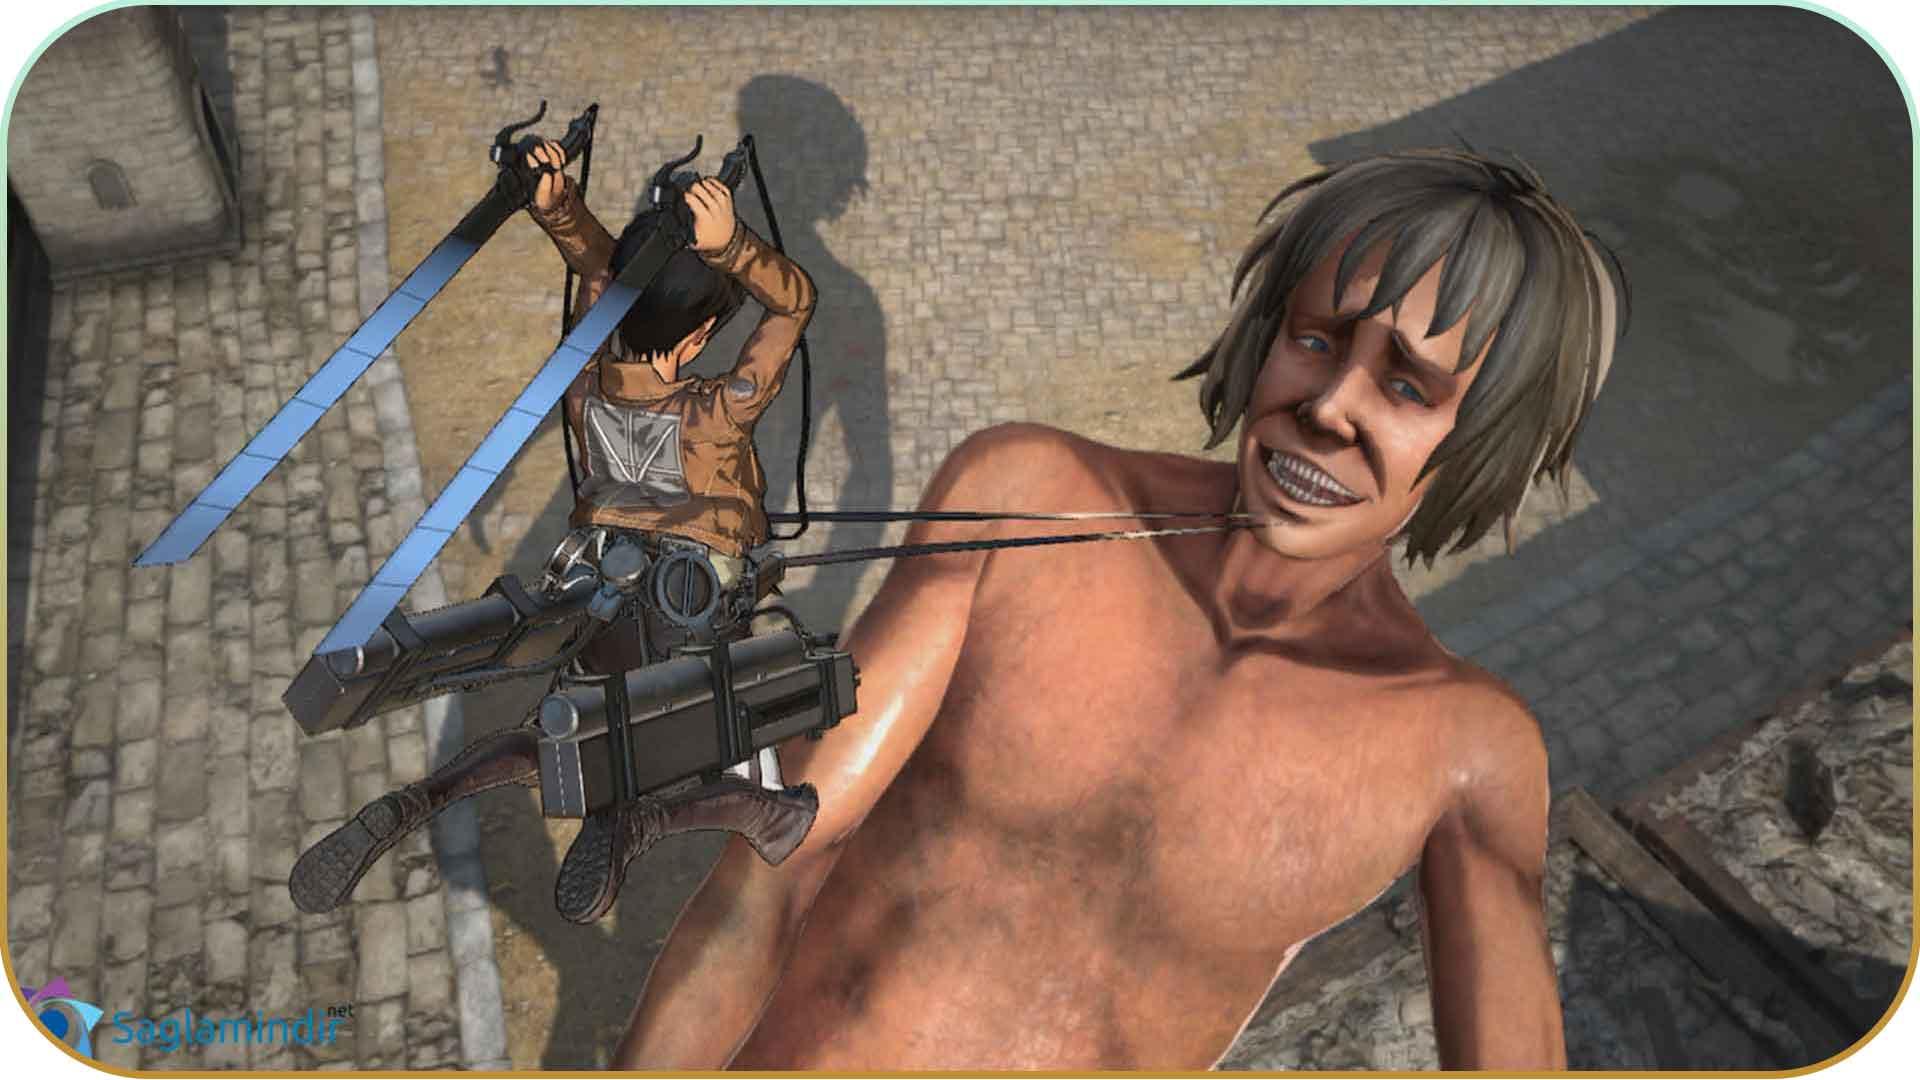 Attack on Titan Wings of Freedom saglamindir